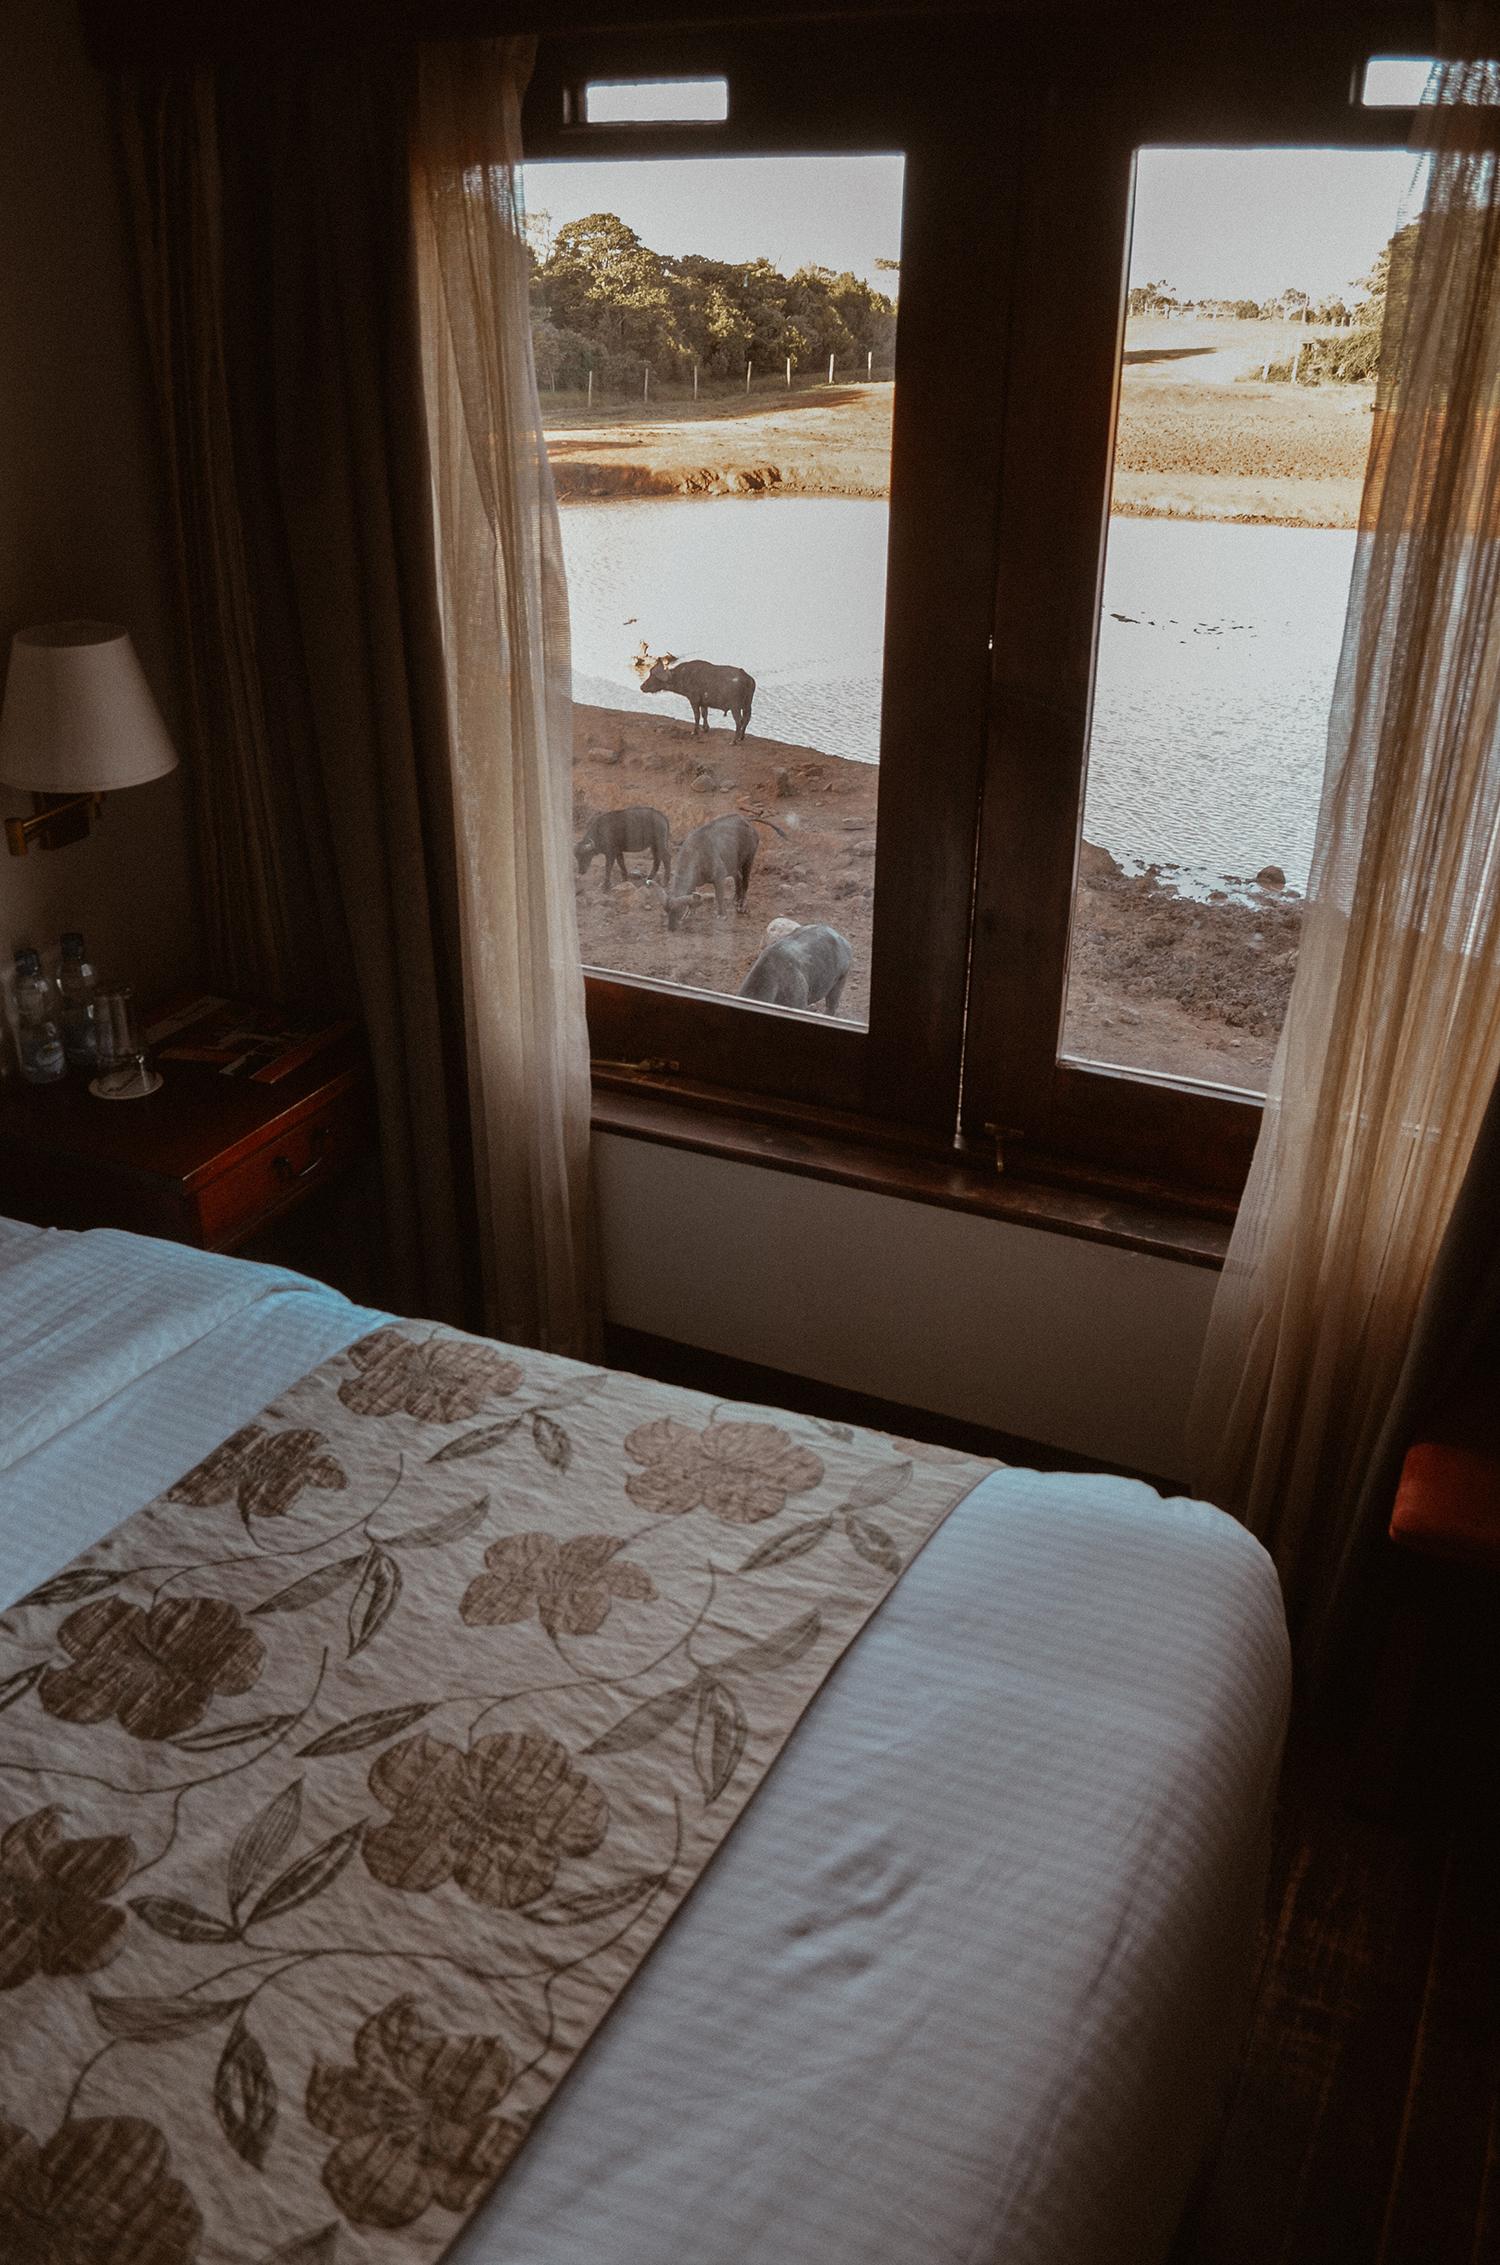 treetops lodge dove dormire kenya regina elisabetta